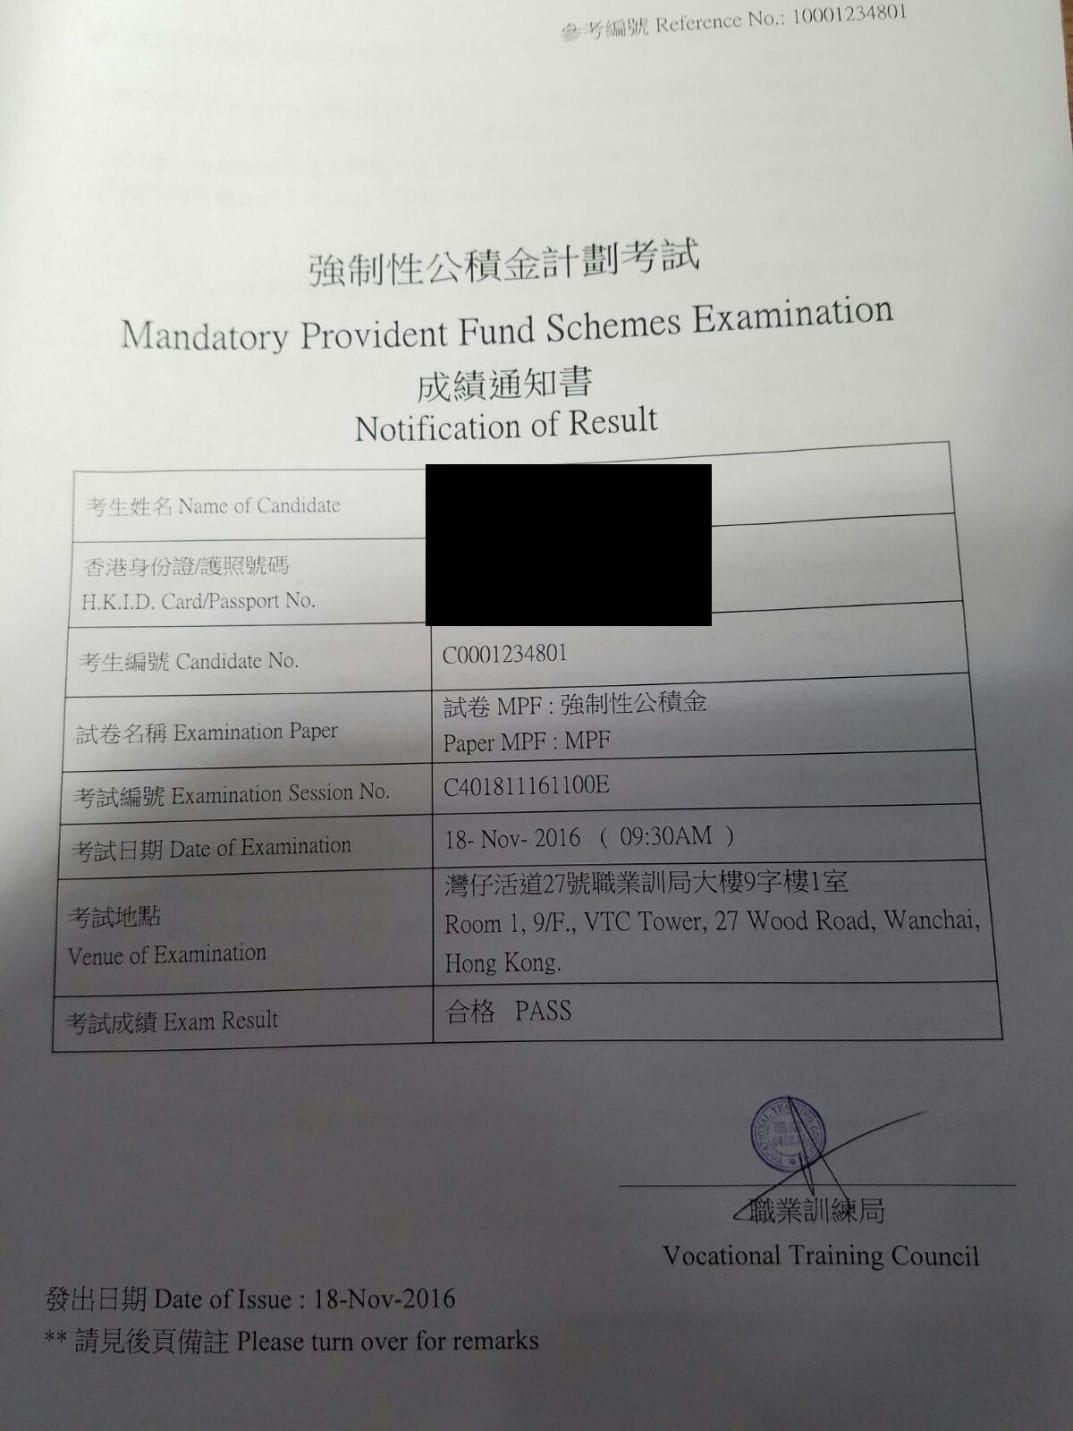 SCK 18/11/2016 MPFE 強積金中介人資格考試 Pass